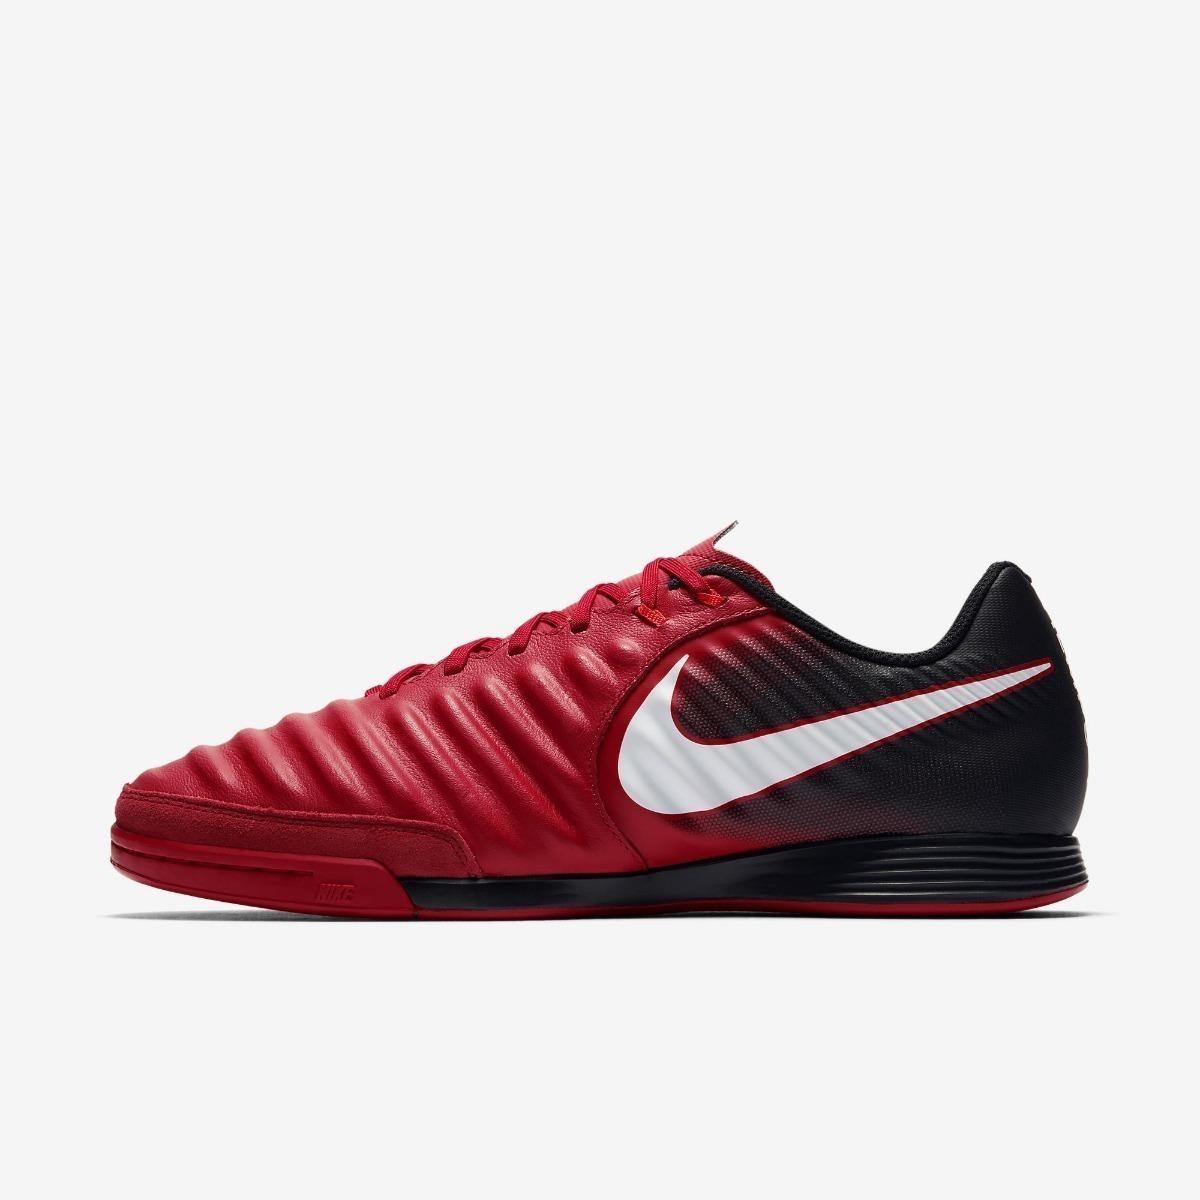 Chuteira Nike Tiempox Ligera Iv 4 Ic - Futsal - Original - R  299 83fe9581c4363